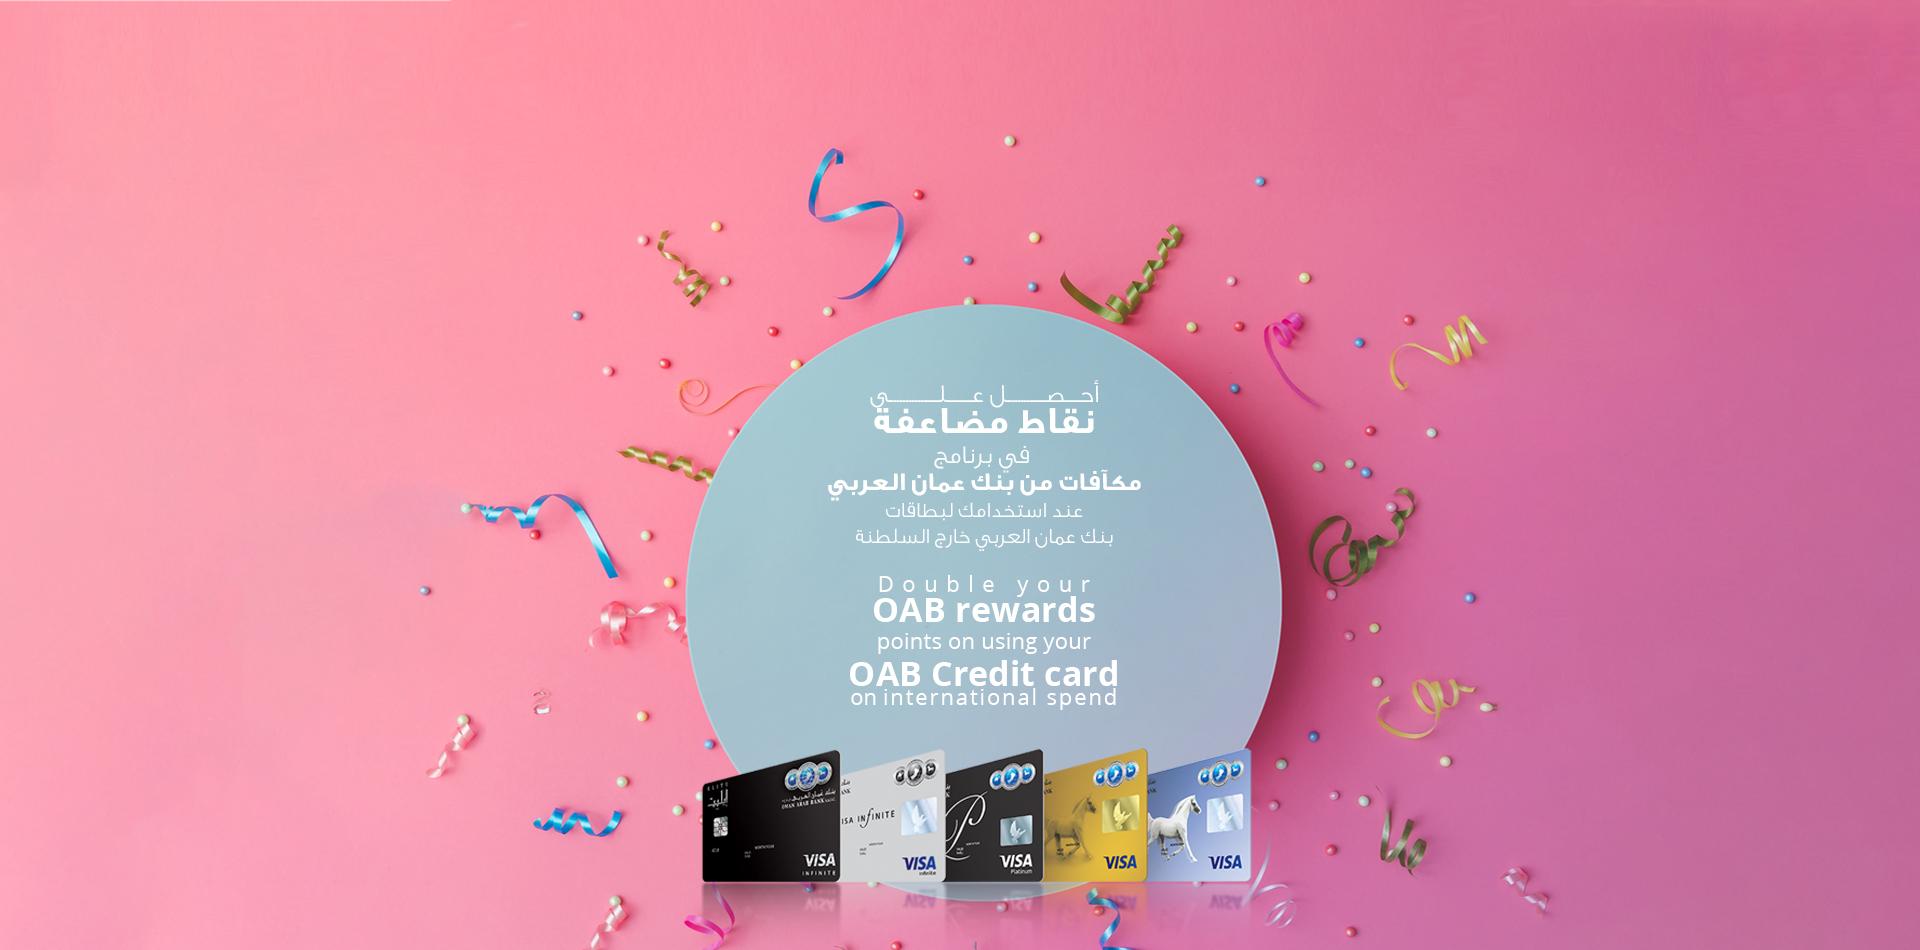 OAB Rewards Website